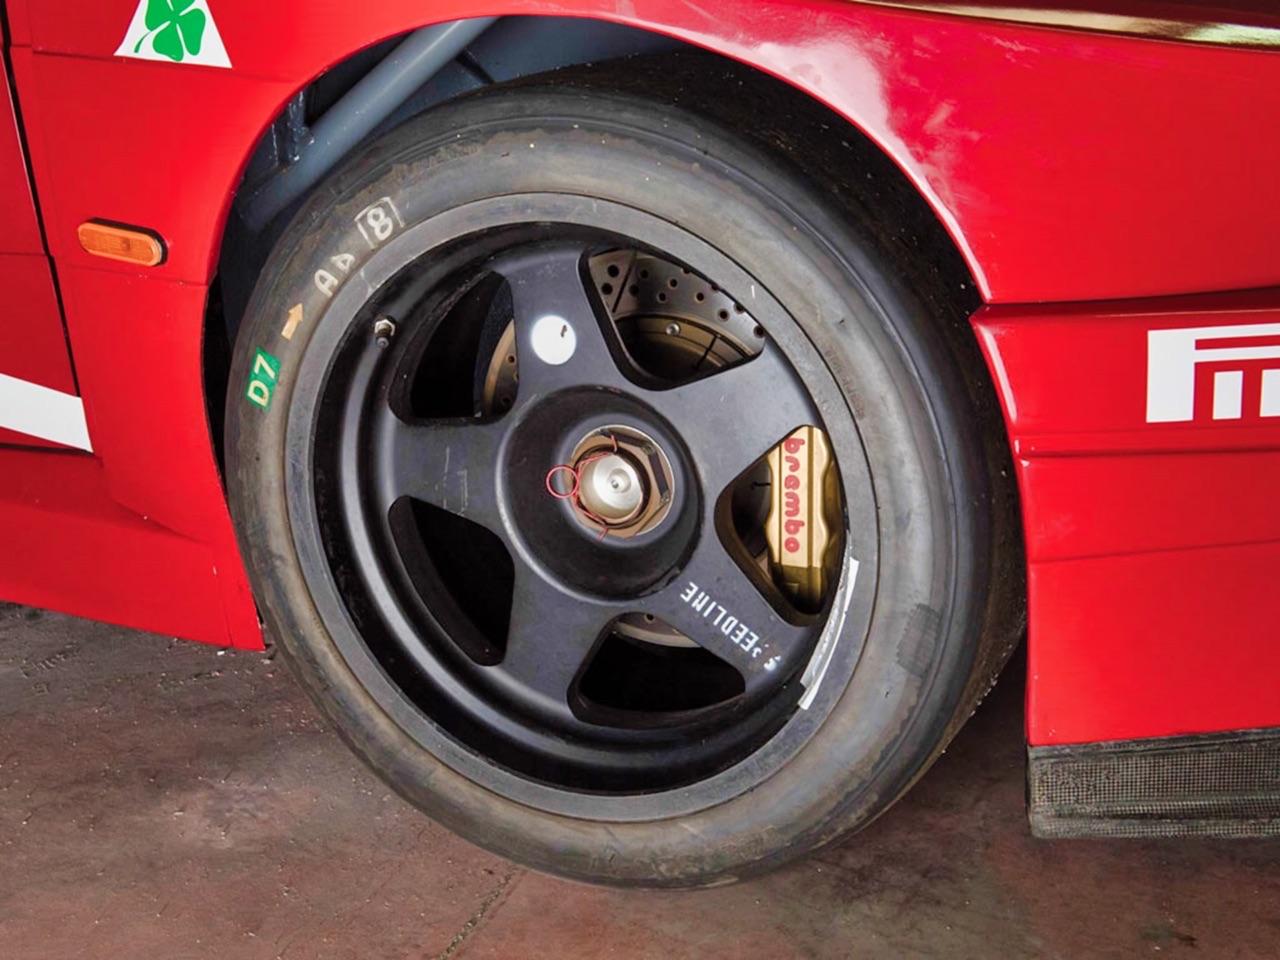 Alfa 75 Turbo IMSA - La plus ultime ! 7